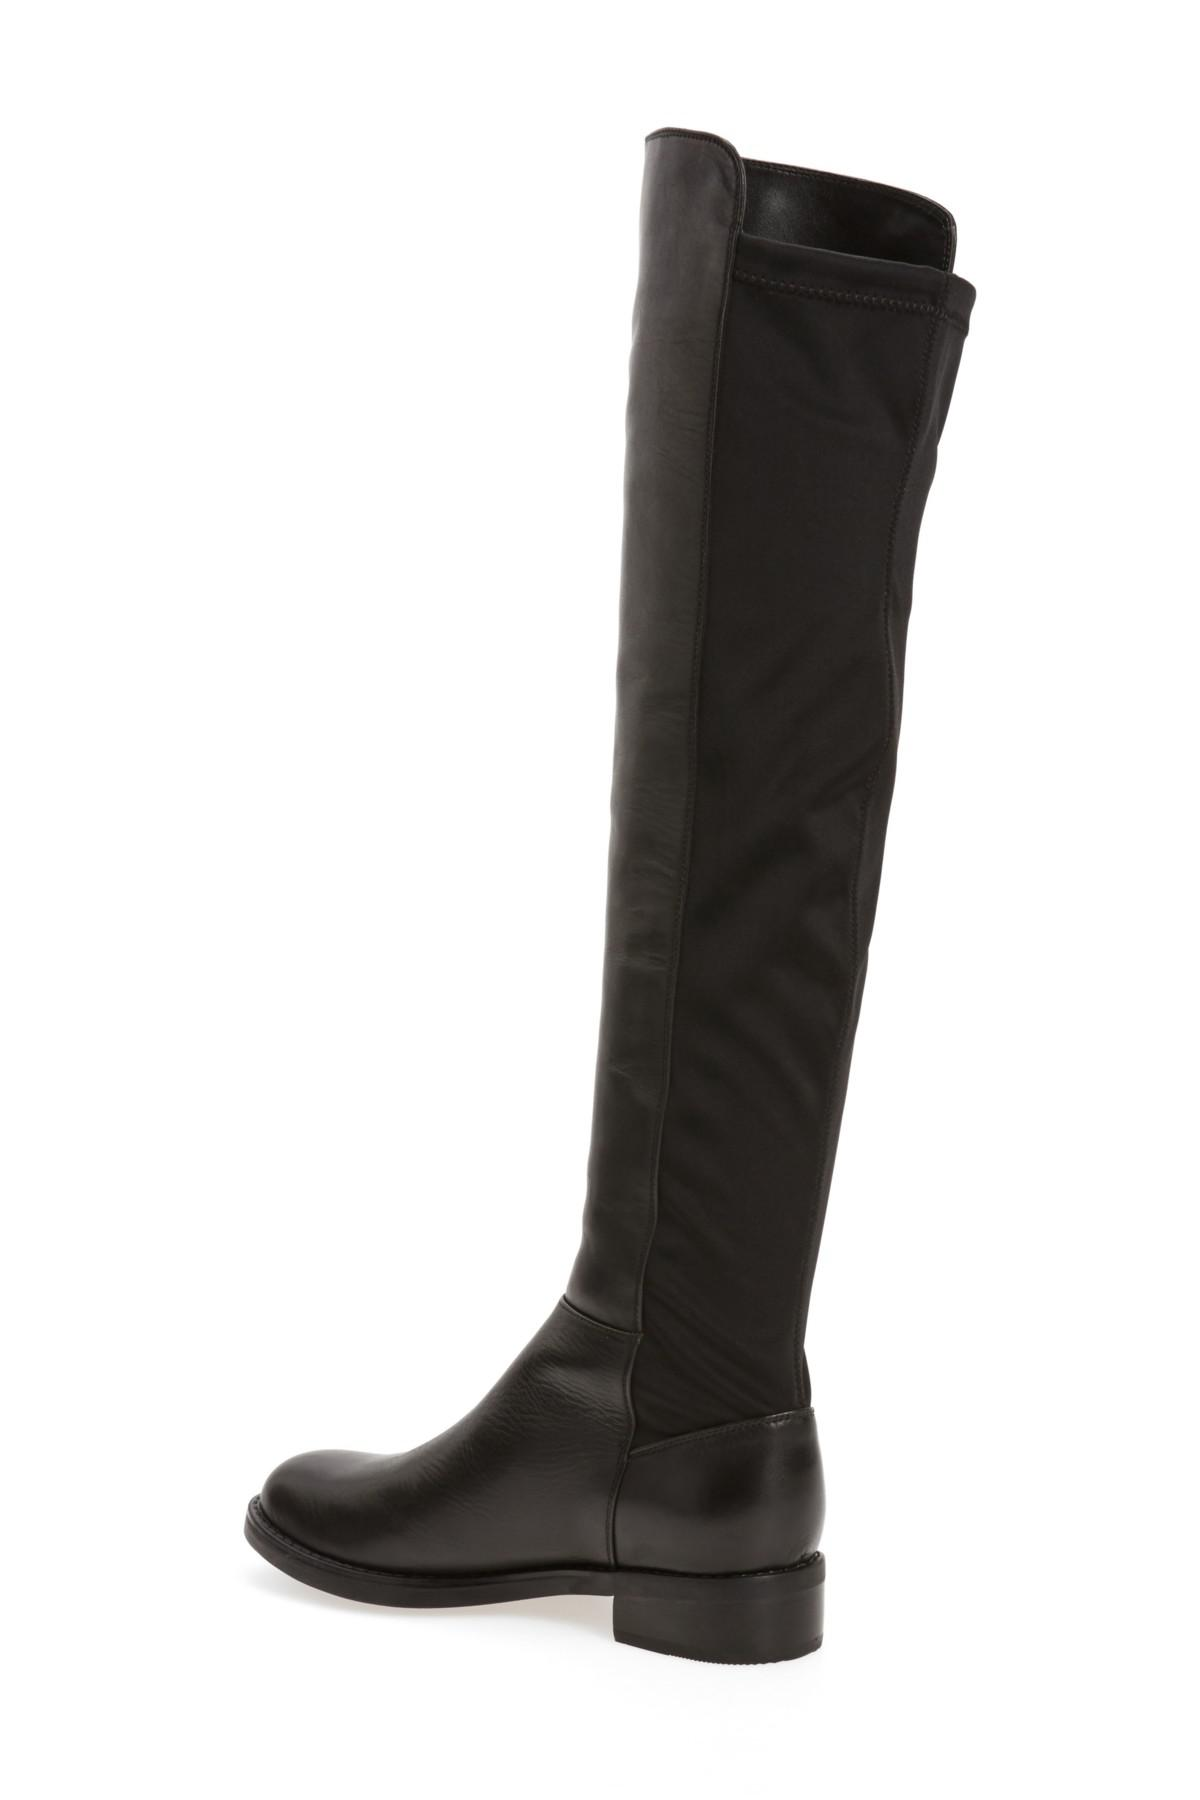 36bd4d55a9c Blondo - Black Olivia Knee High Boot - Lyst. View fullscreen